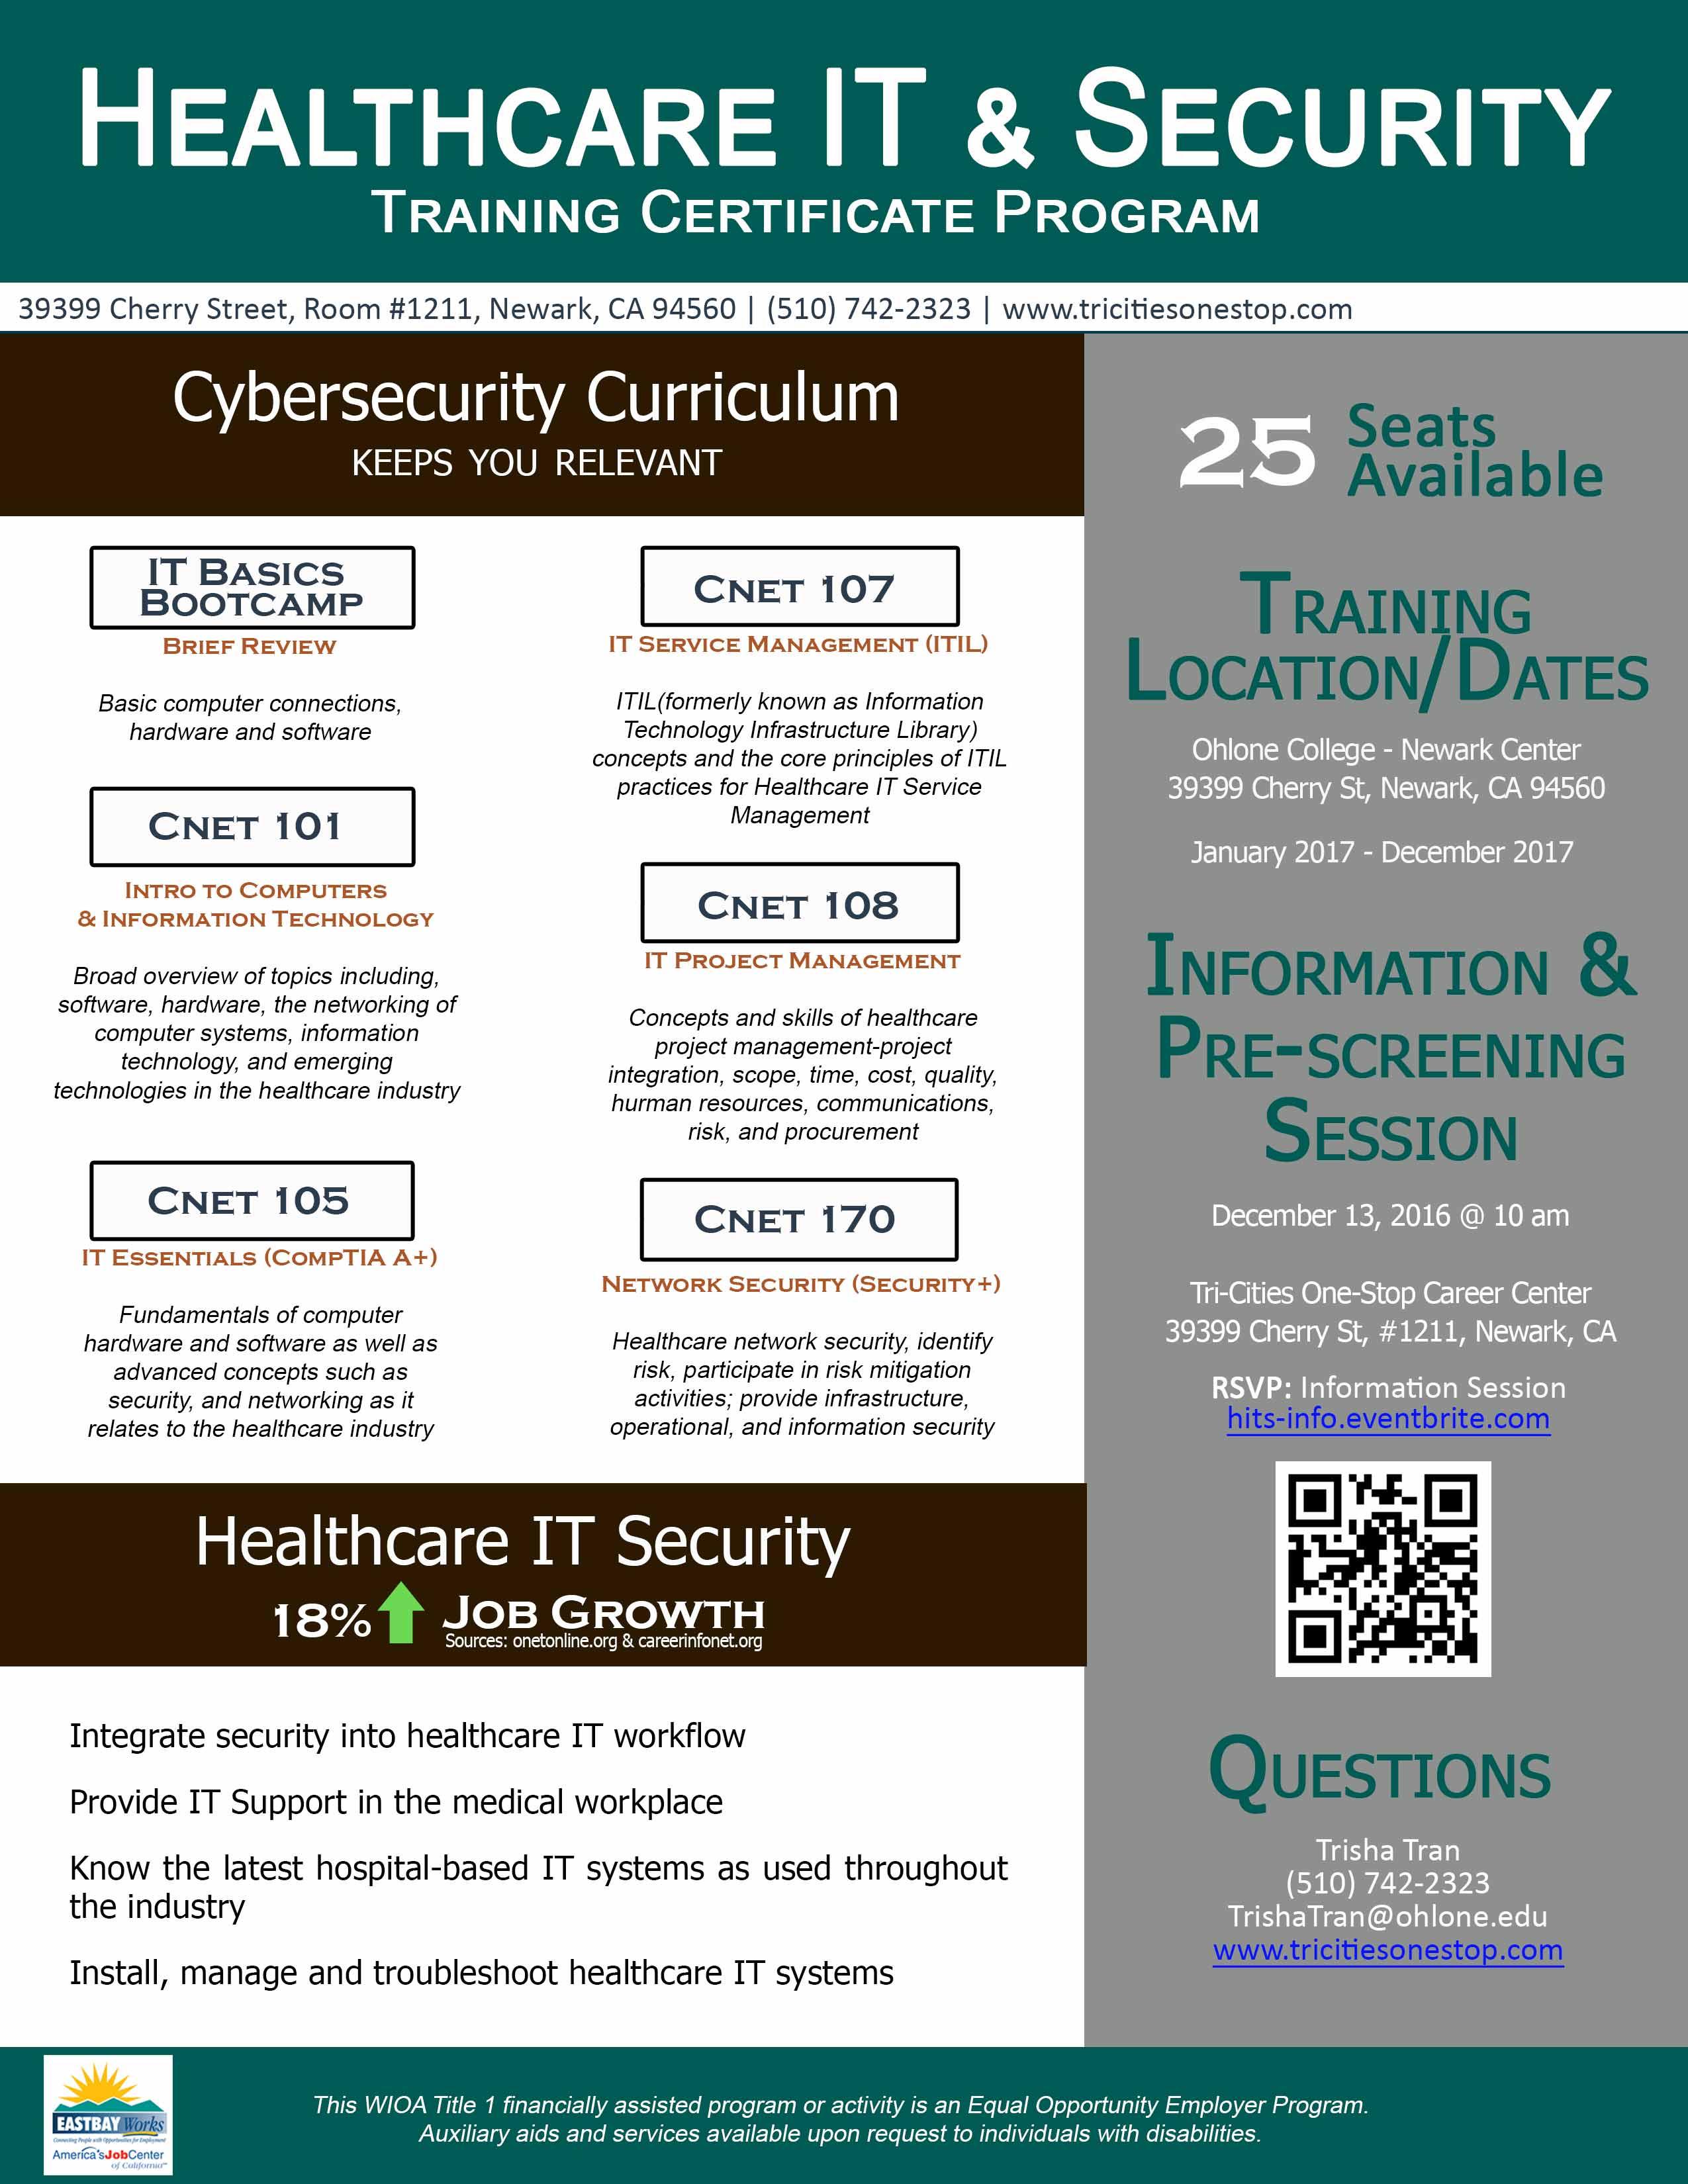 Healthcare IT Security flyer